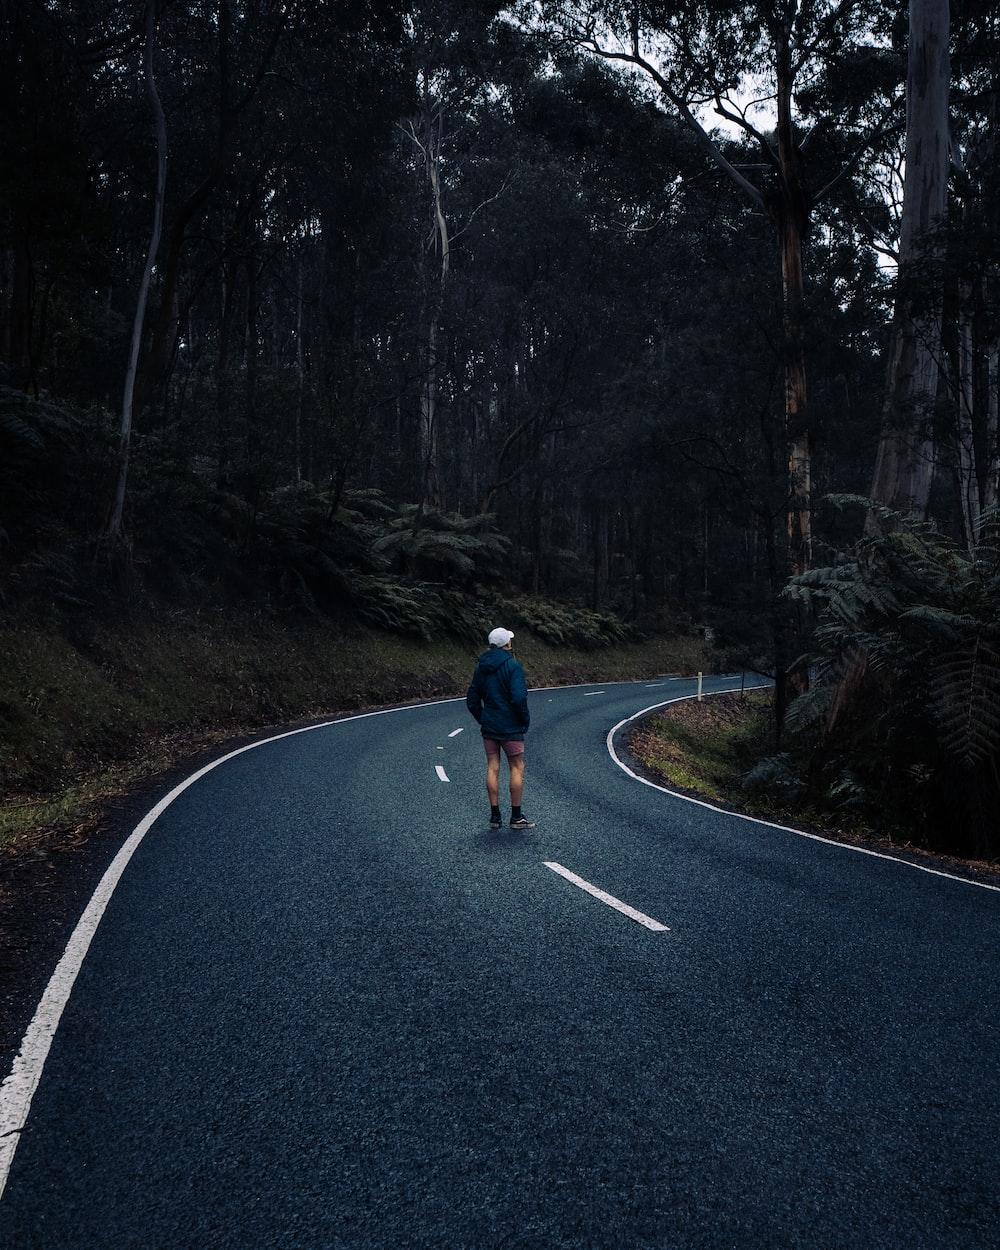 man in black jacket and blue denim jeans walking on road during daytime